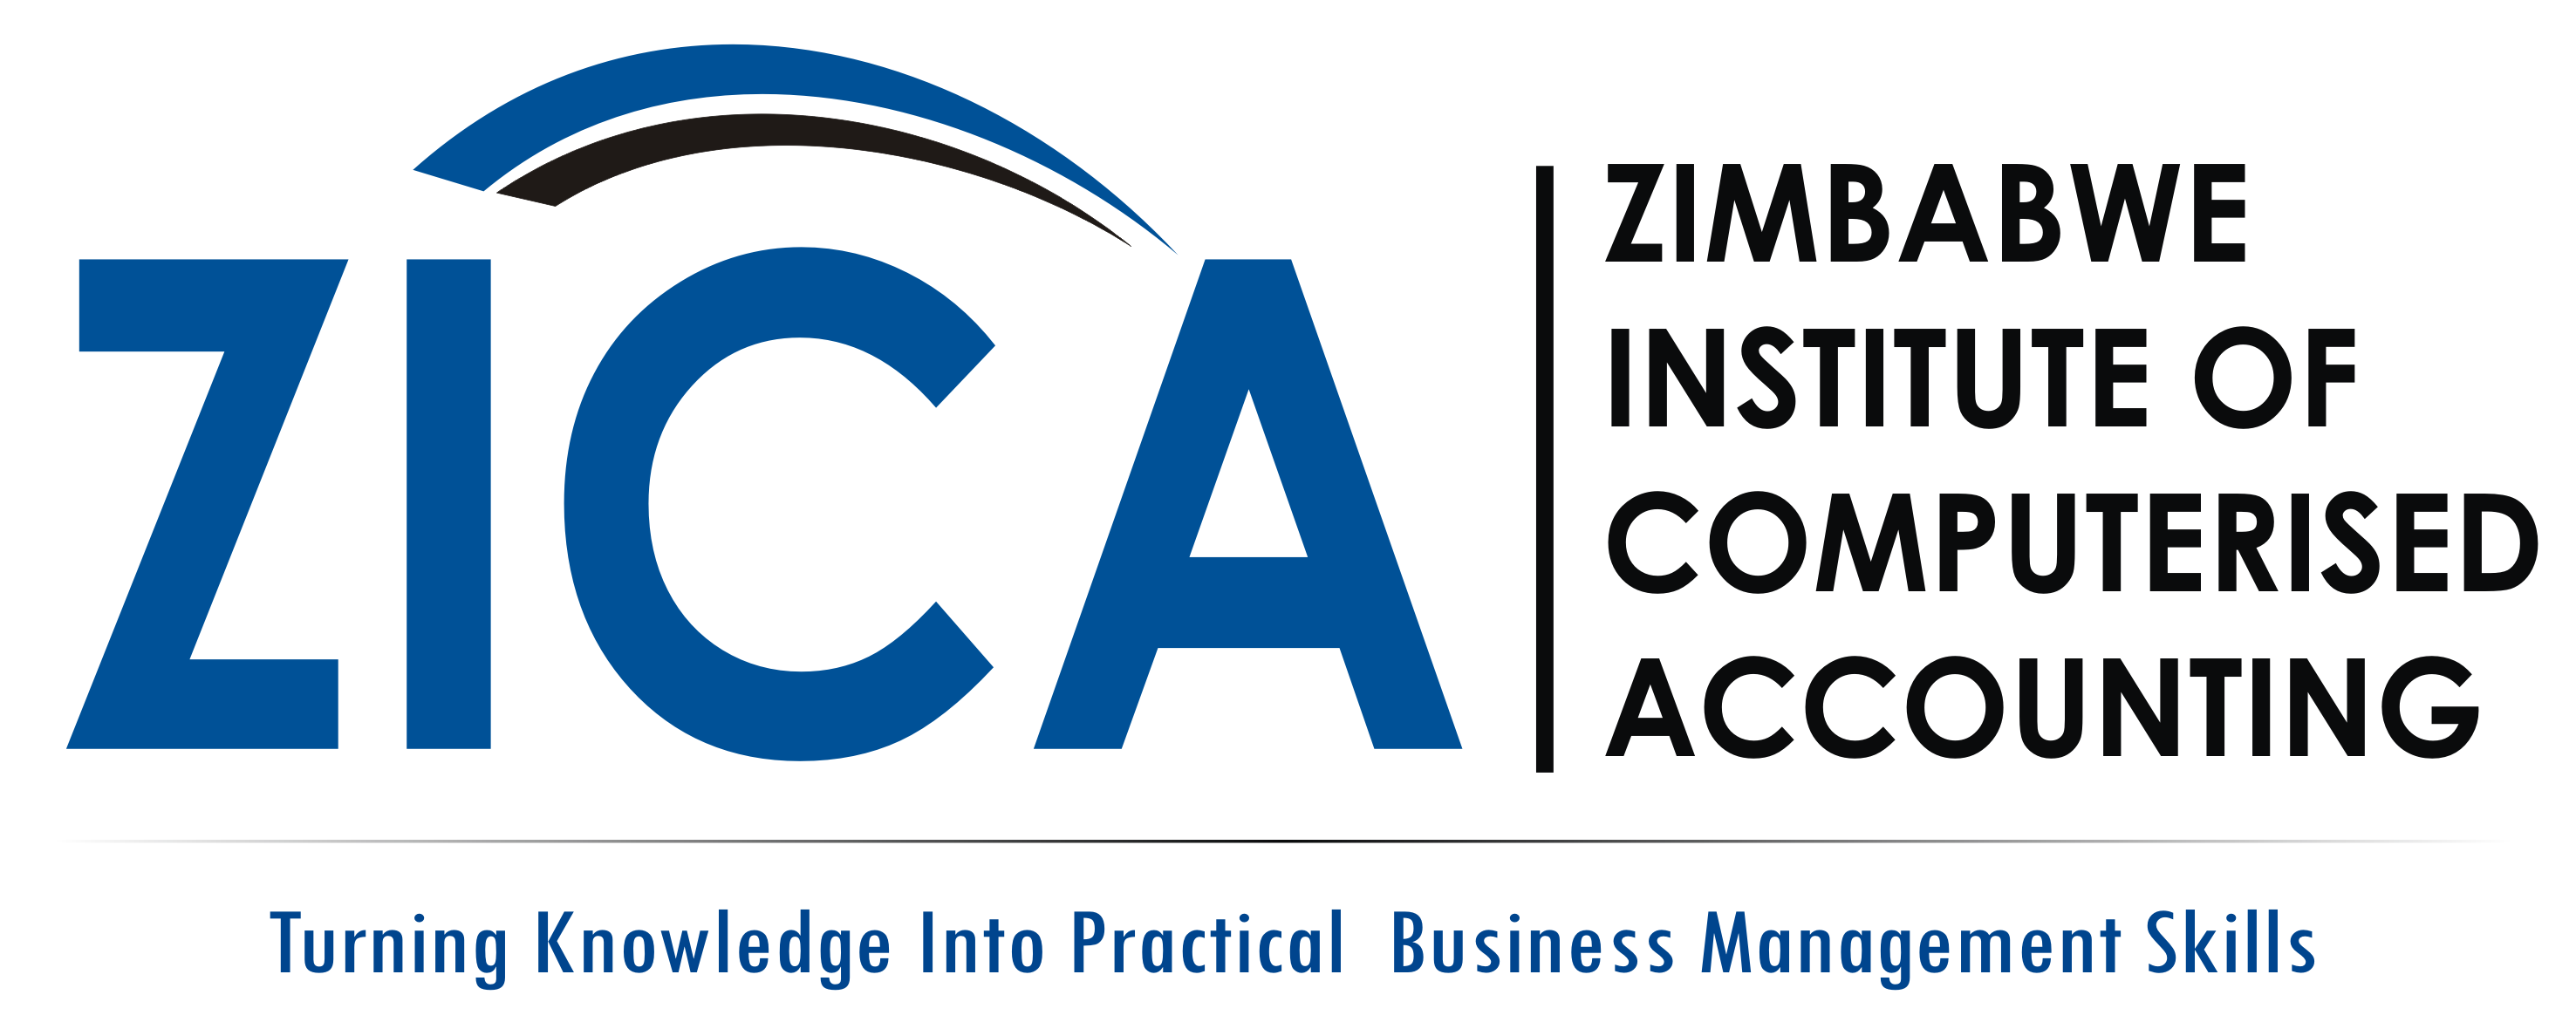 Zimbabwe Institute of Computerized Accounting